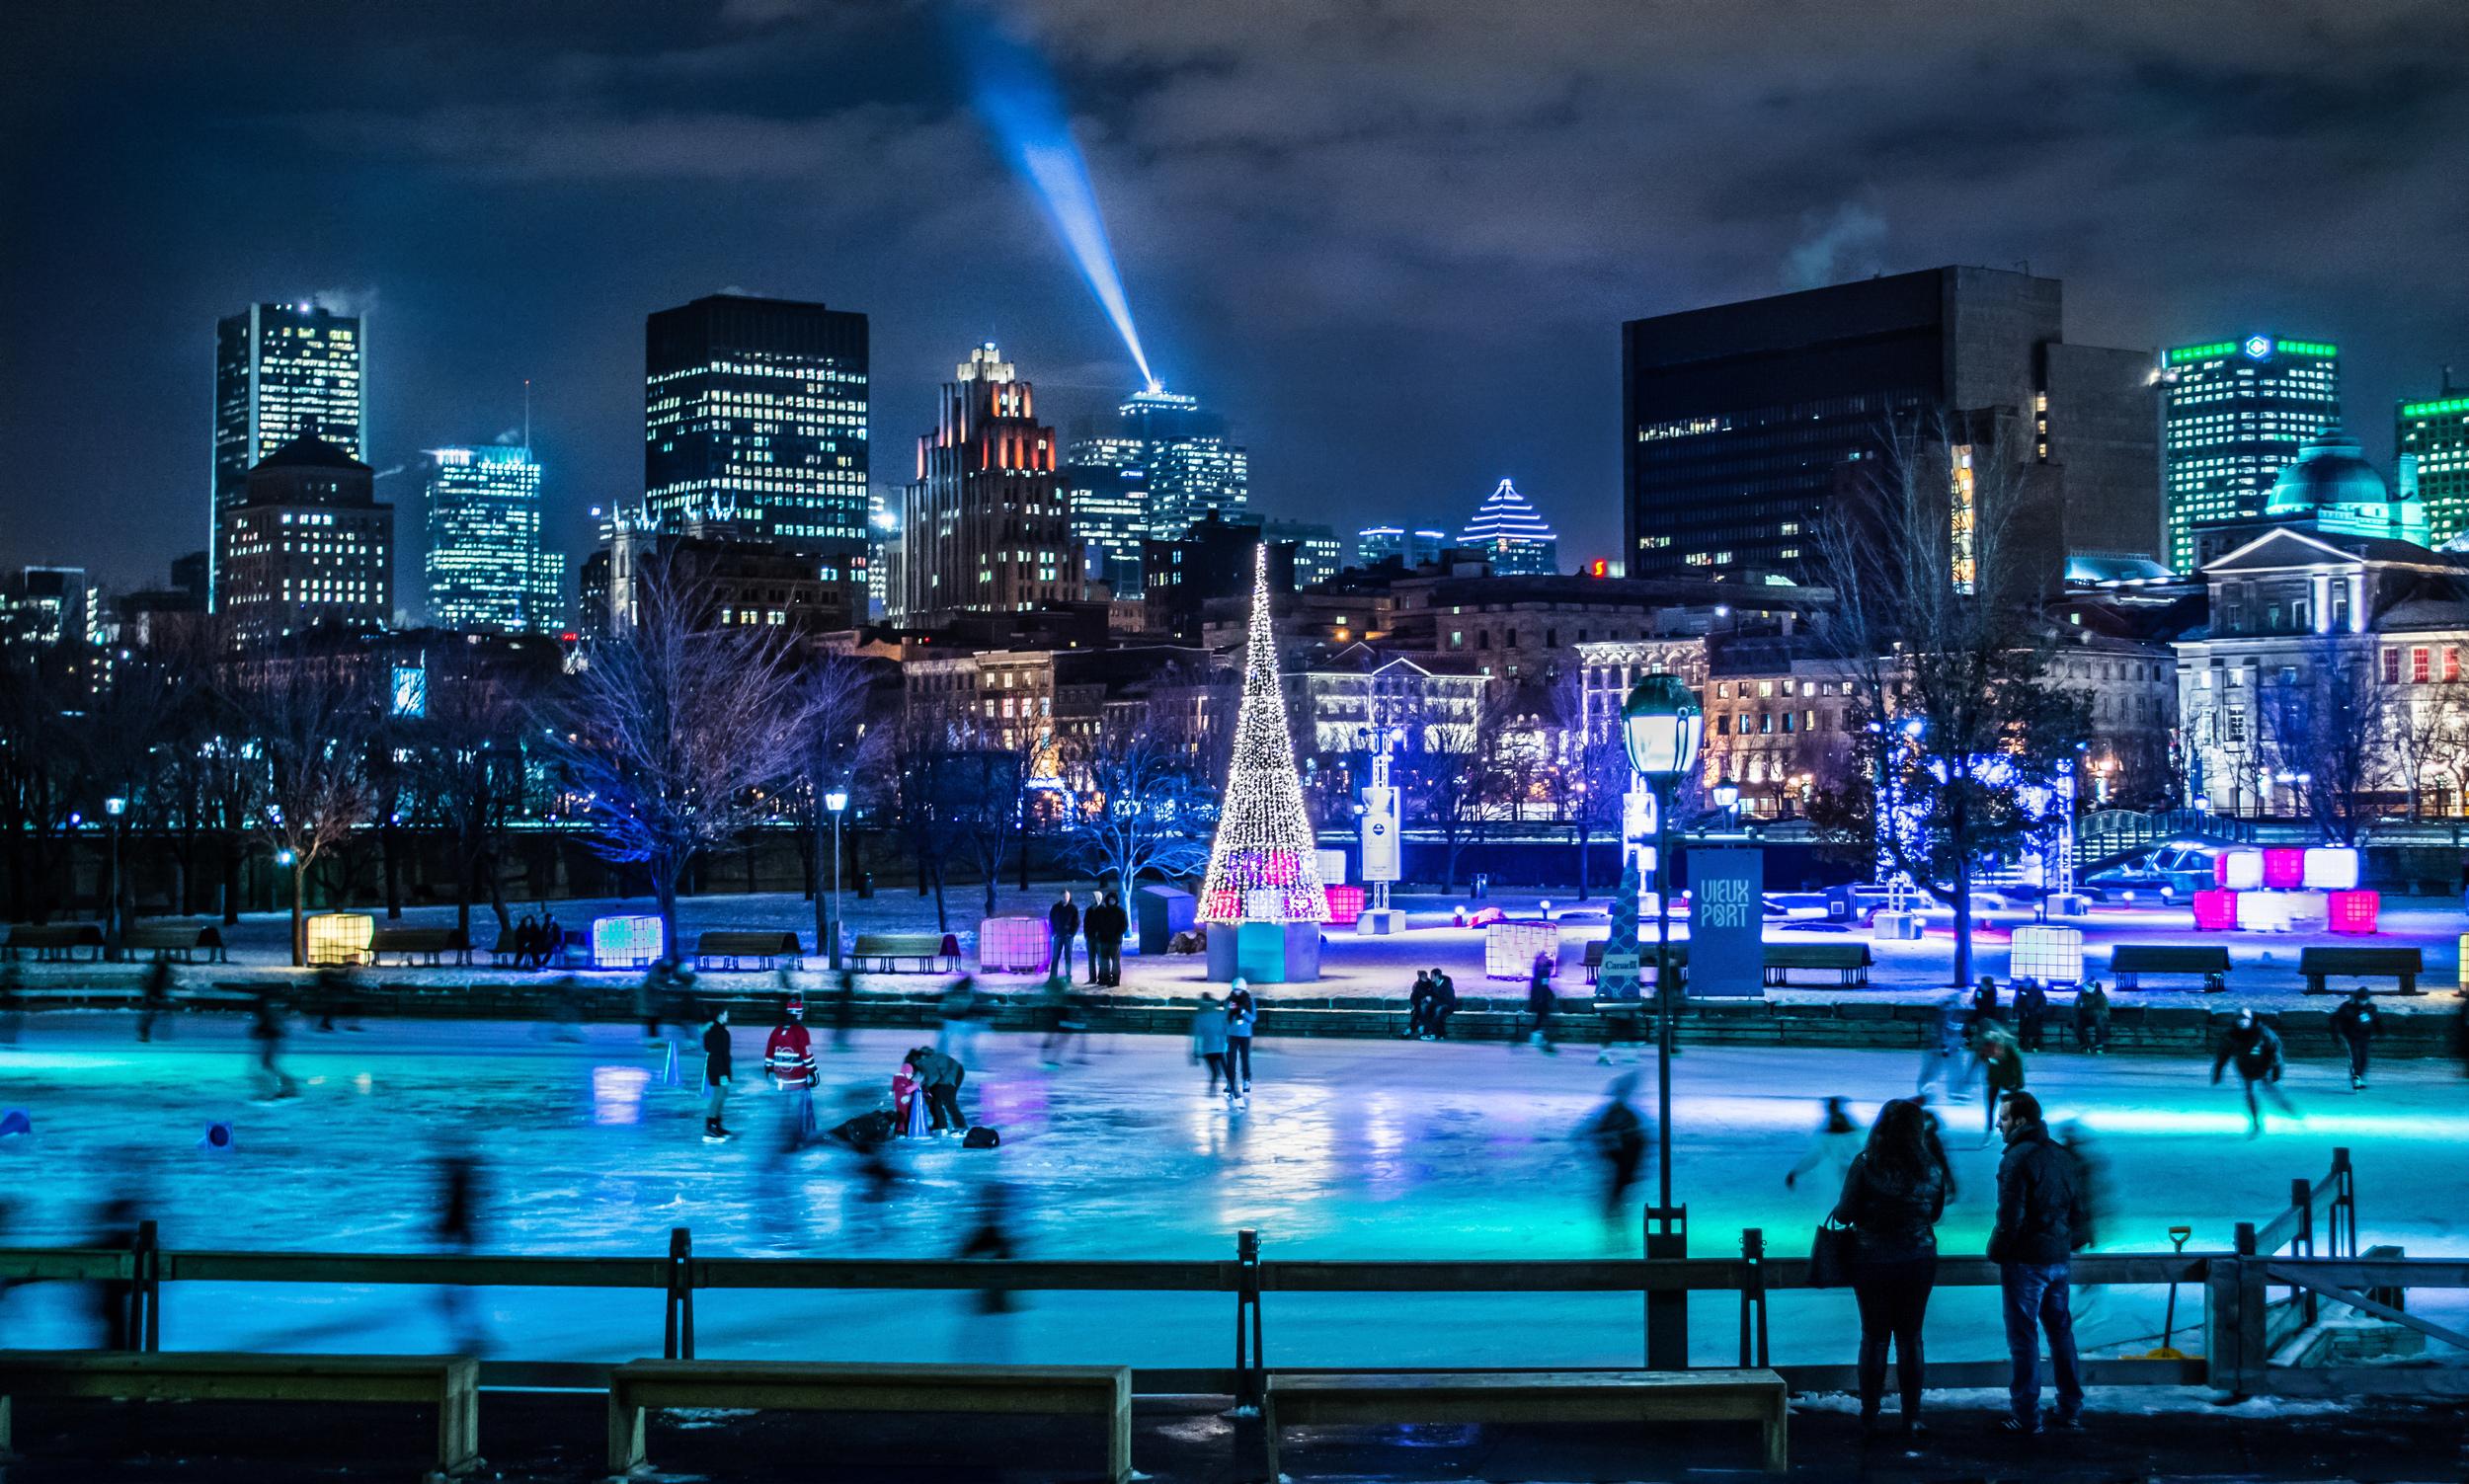 IceRink_Montreal_small.jpg